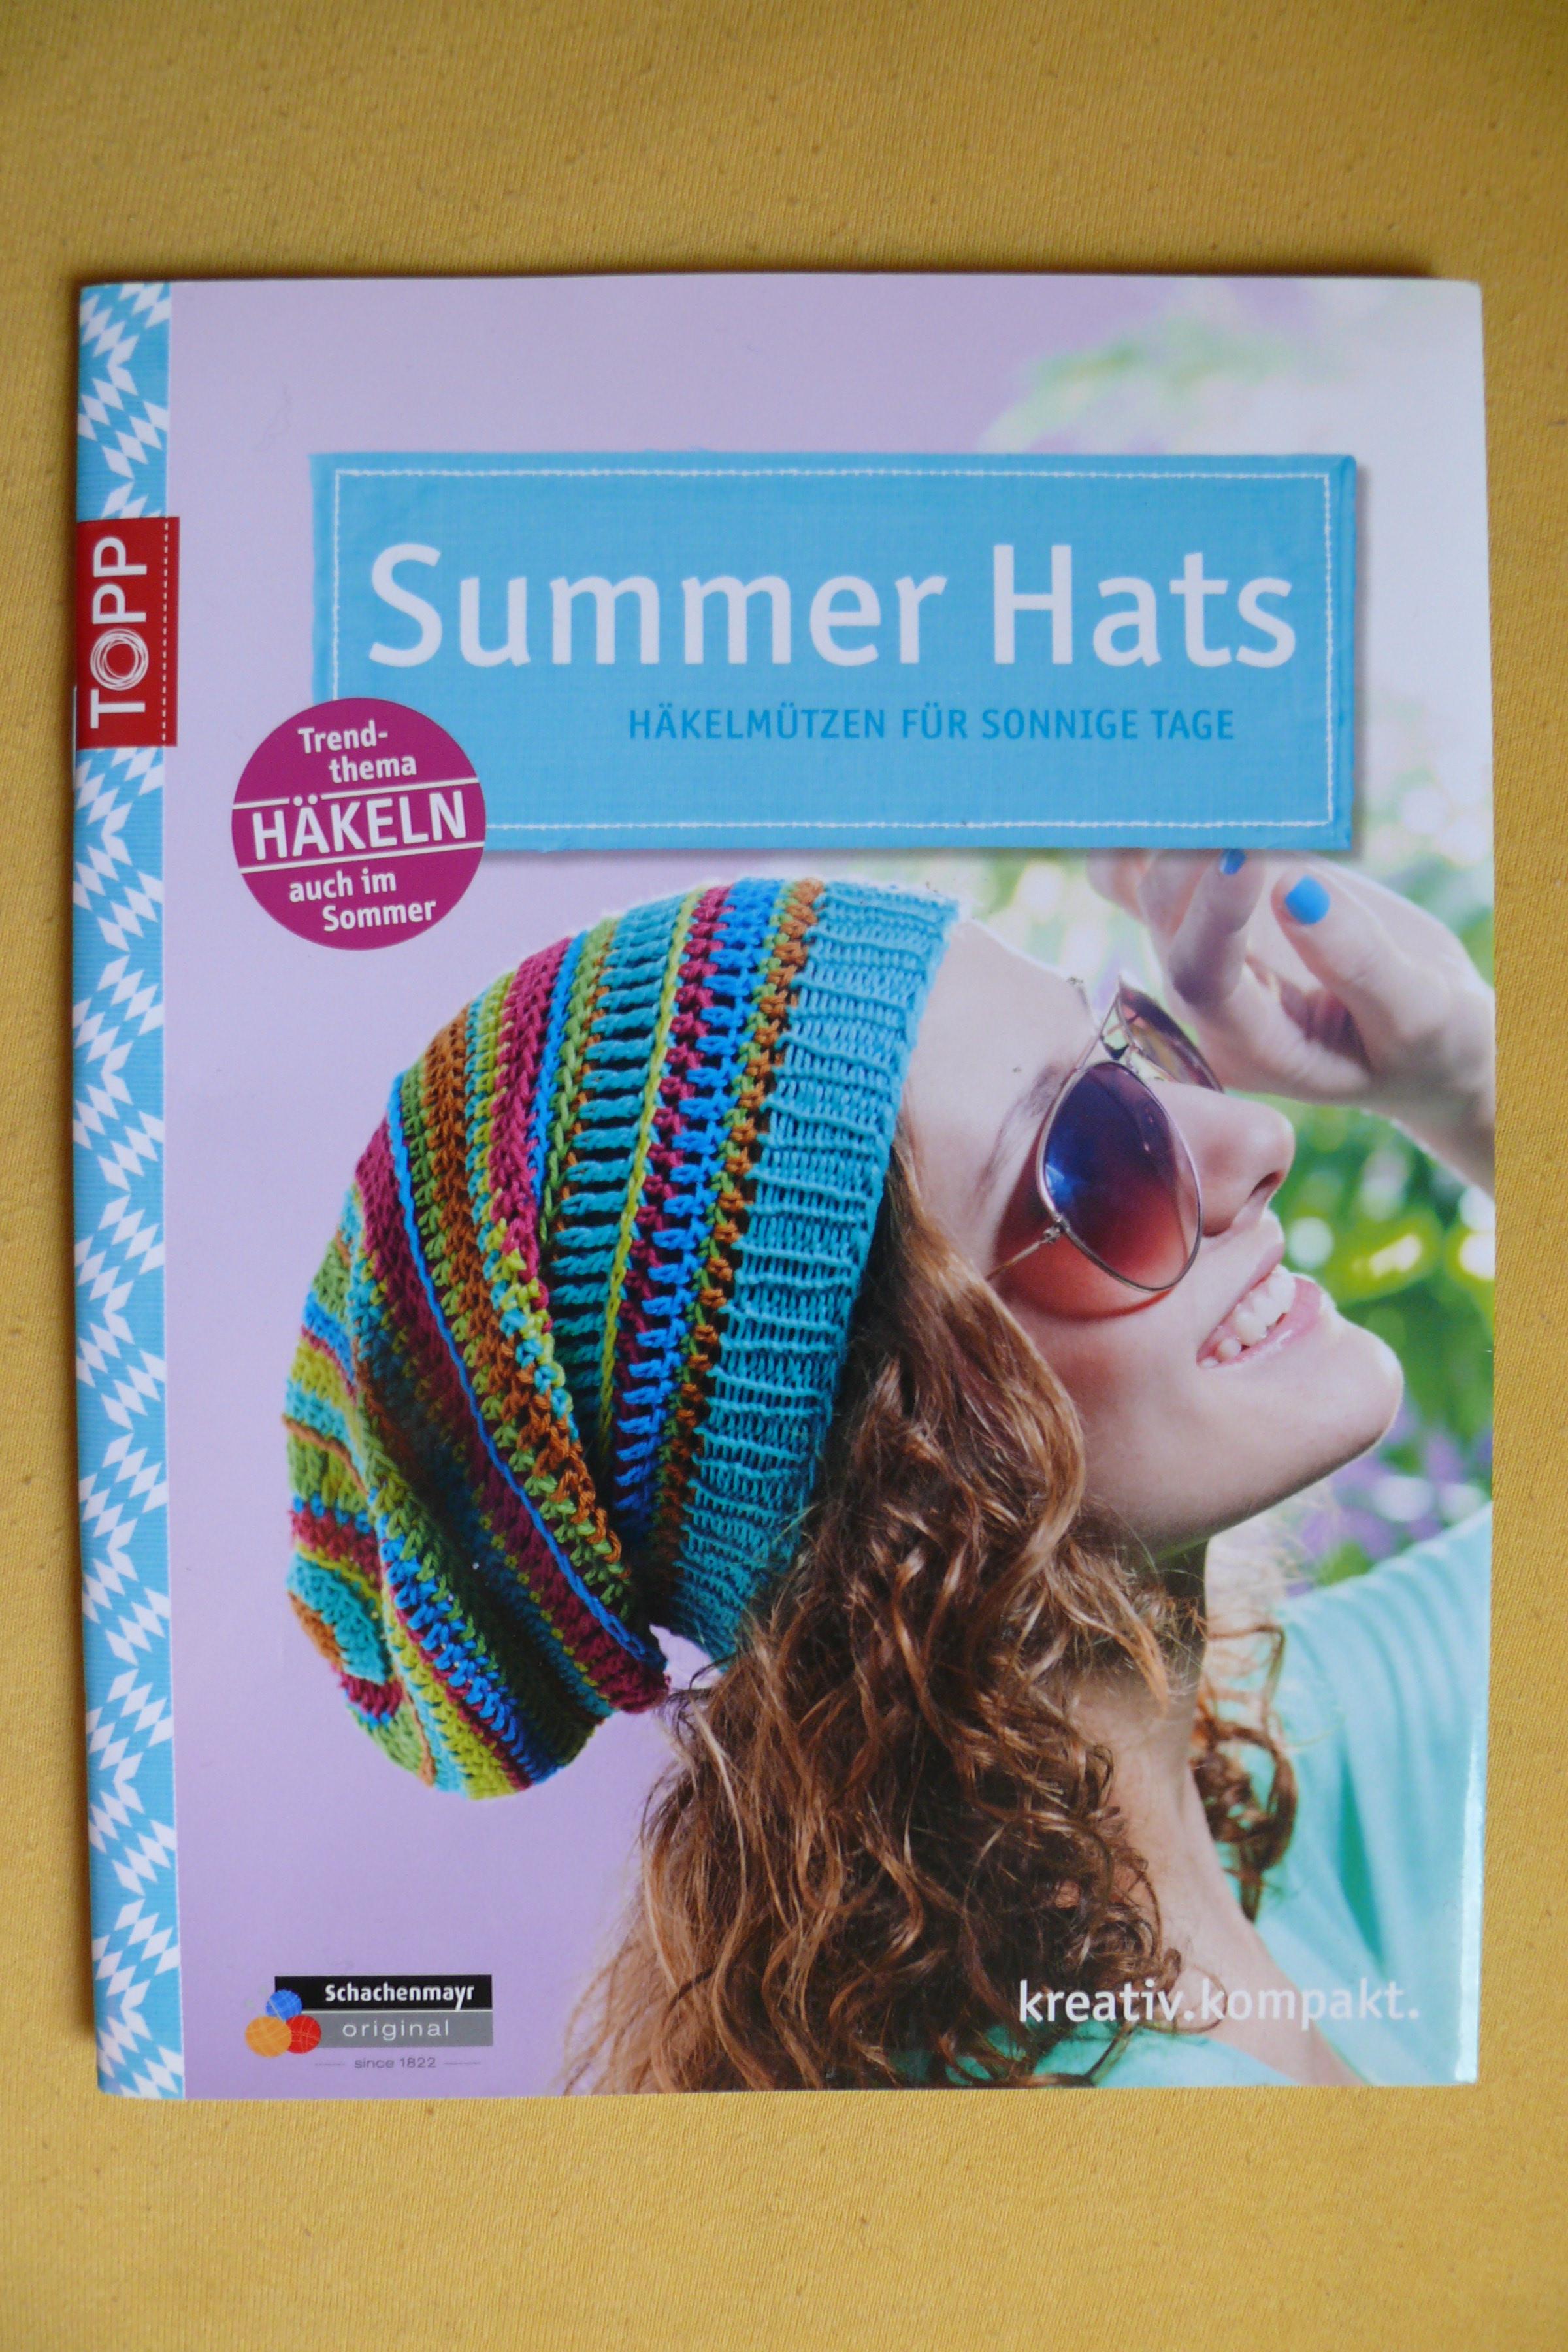 Summer Hats Häkelmützen Topp 2013